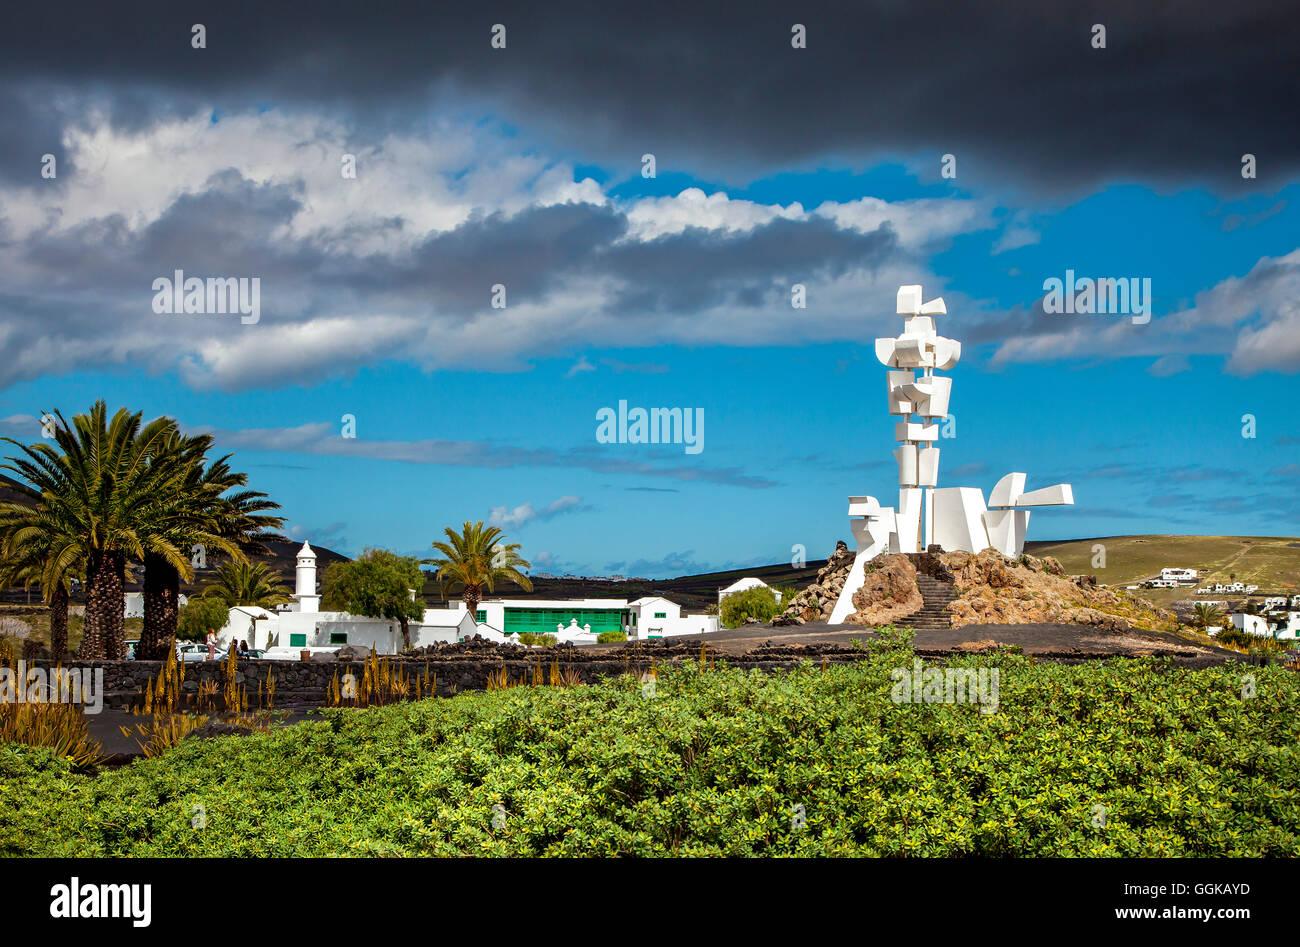 Monumento al Campesino, Cesar Manrique, San Bartholome, Lanzarote, Isole Canarie, Spagna Immagini Stock